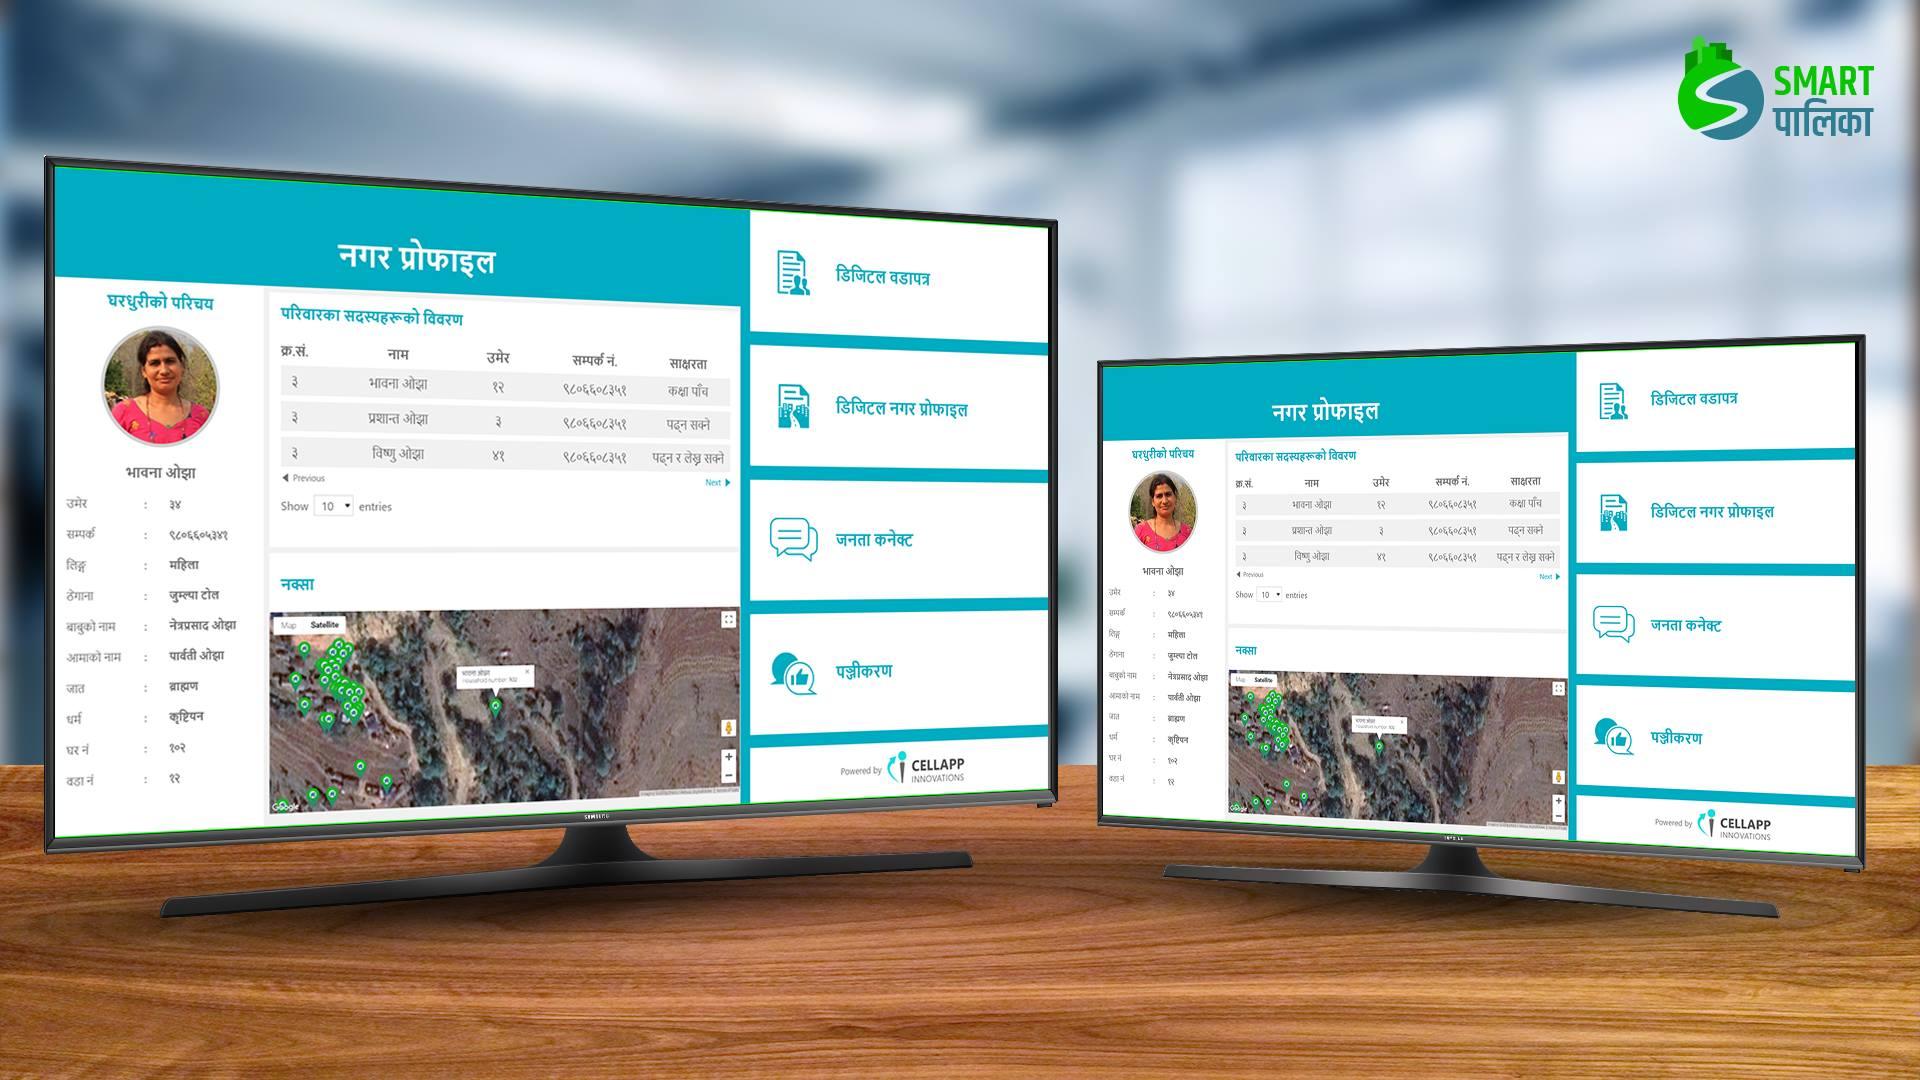 SP desktop interface